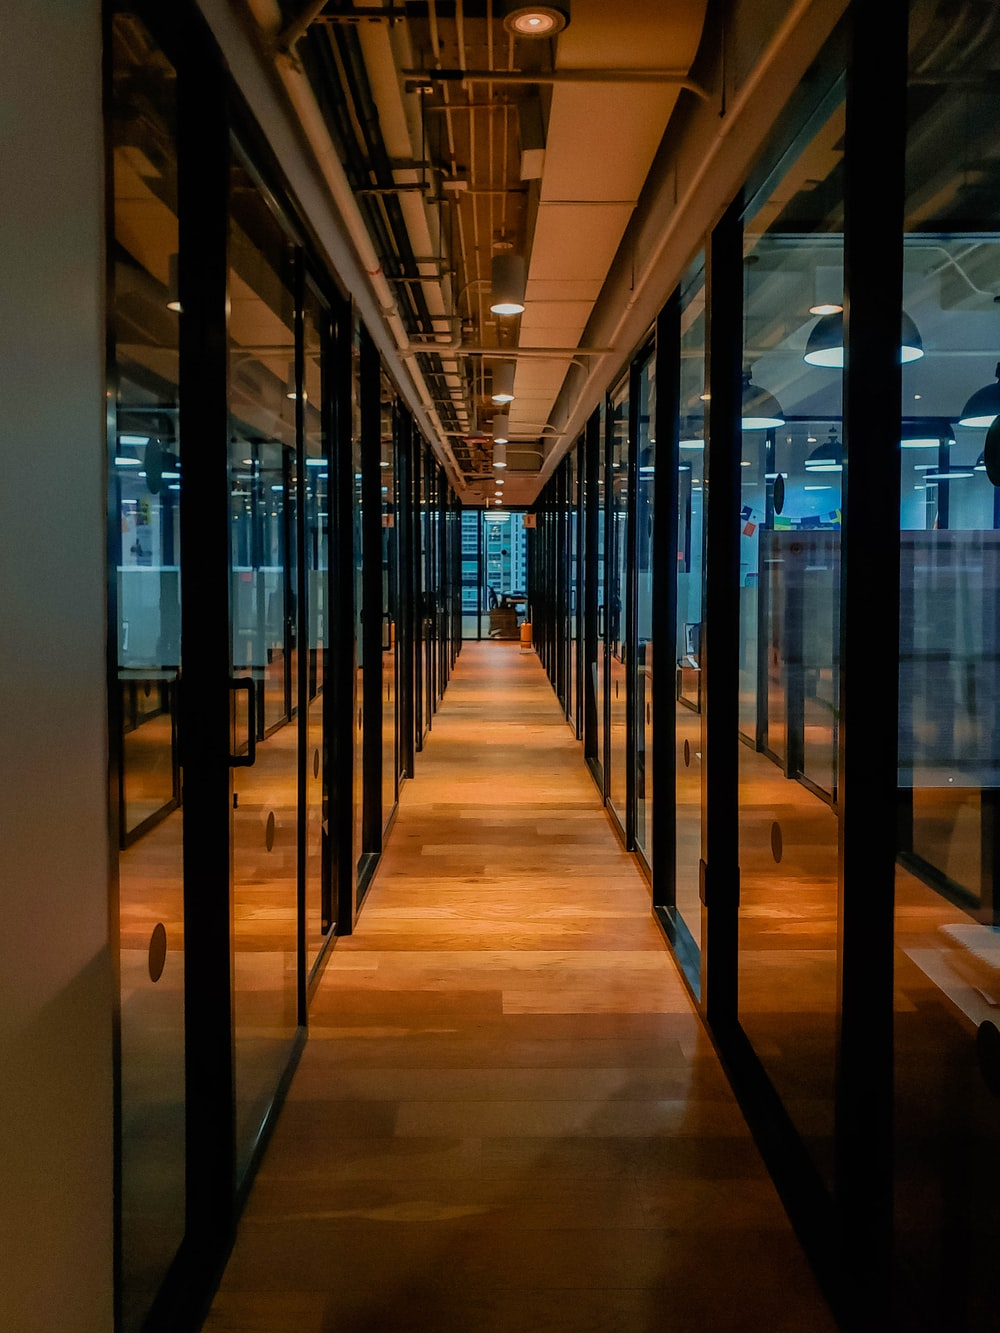 glass paneled long wooden floored hallway